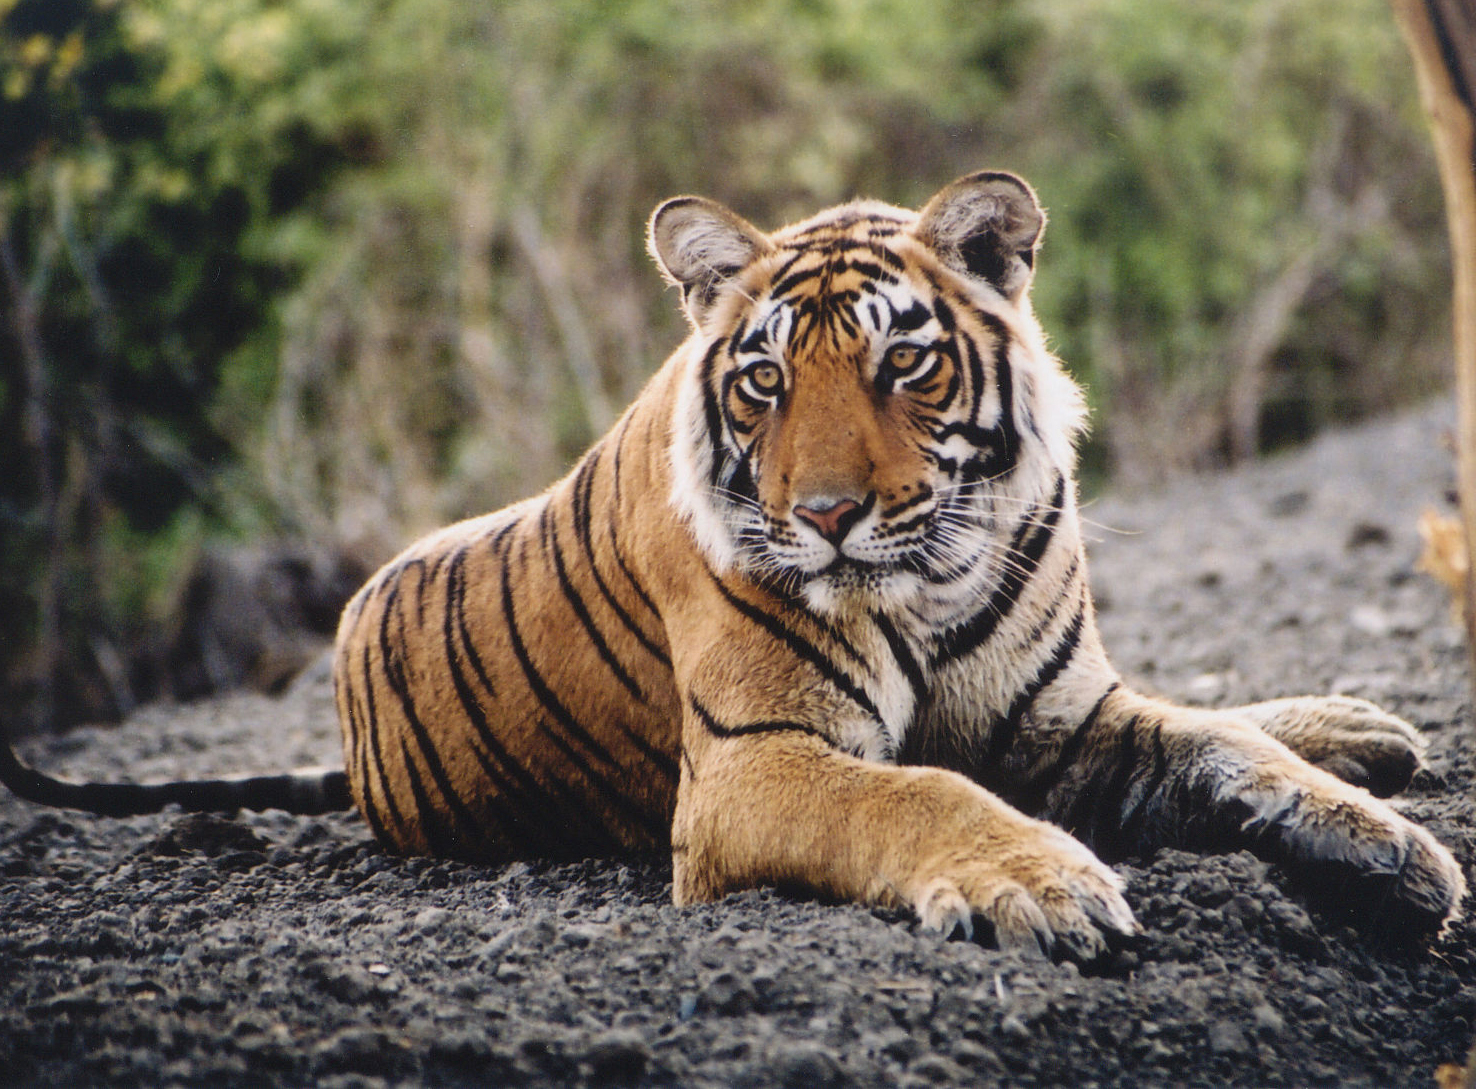 tiger - photo #26